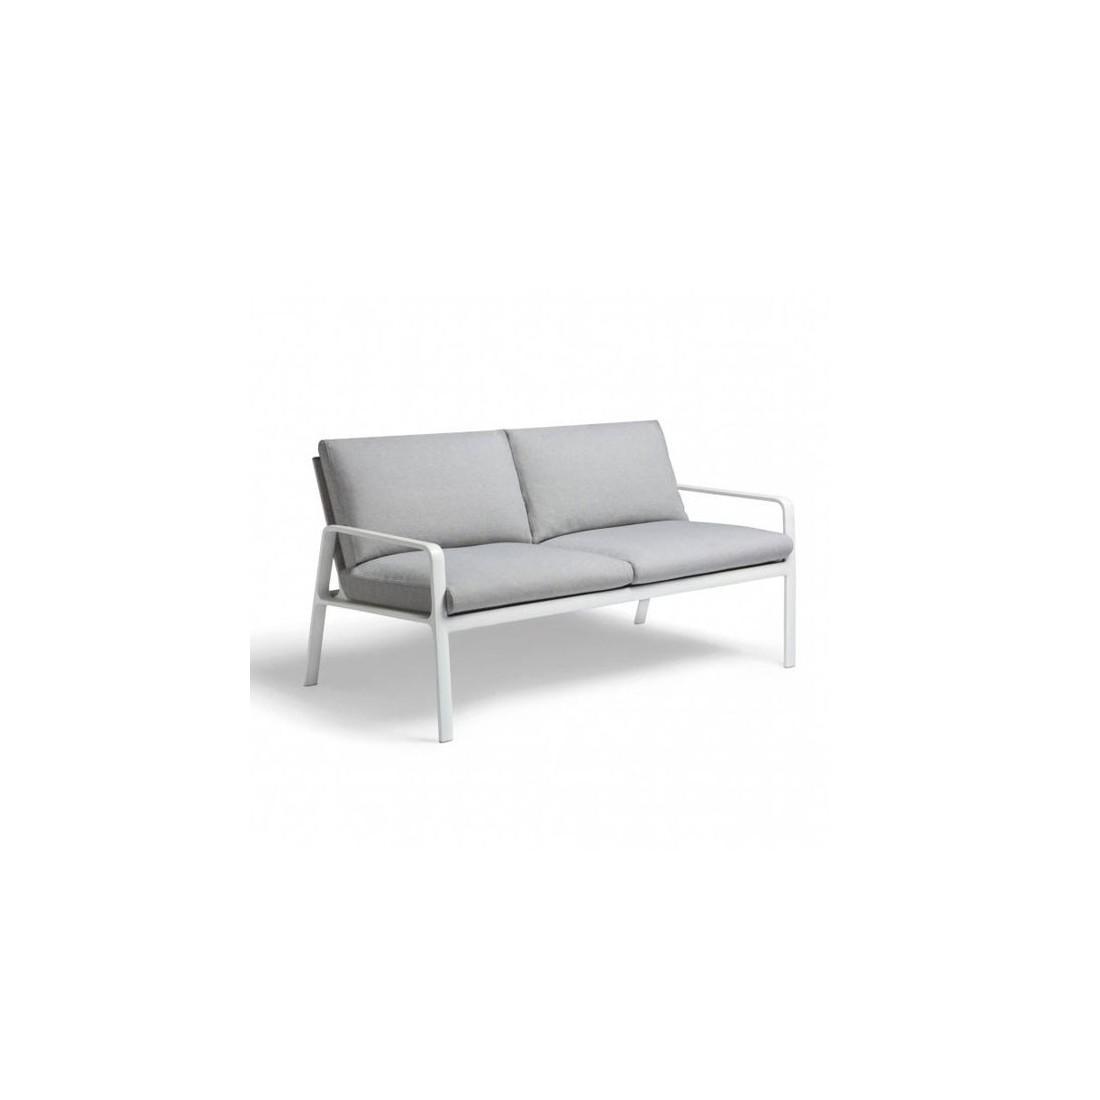 canap 2 places park life kettal confort jardin. Black Bedroom Furniture Sets. Home Design Ideas